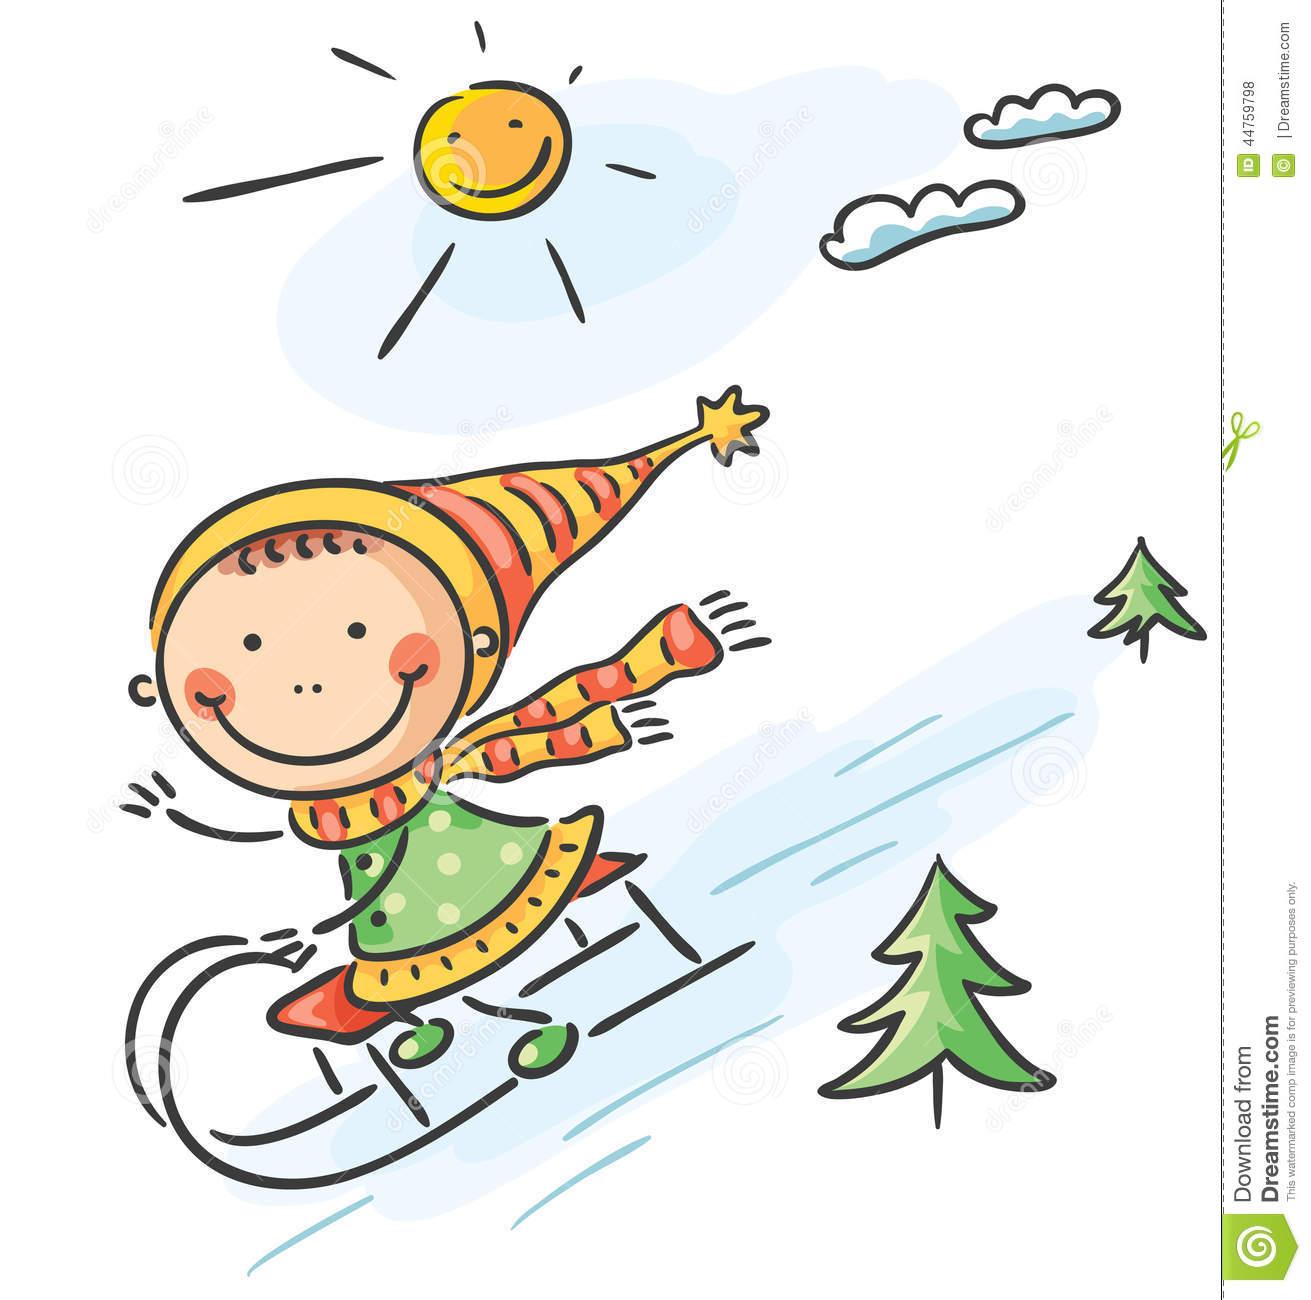 Clipart winter activities graphic freeuse Girl\'s Winter Activities: Sledging Stock Vector Image - Free Clipart graphic freeuse